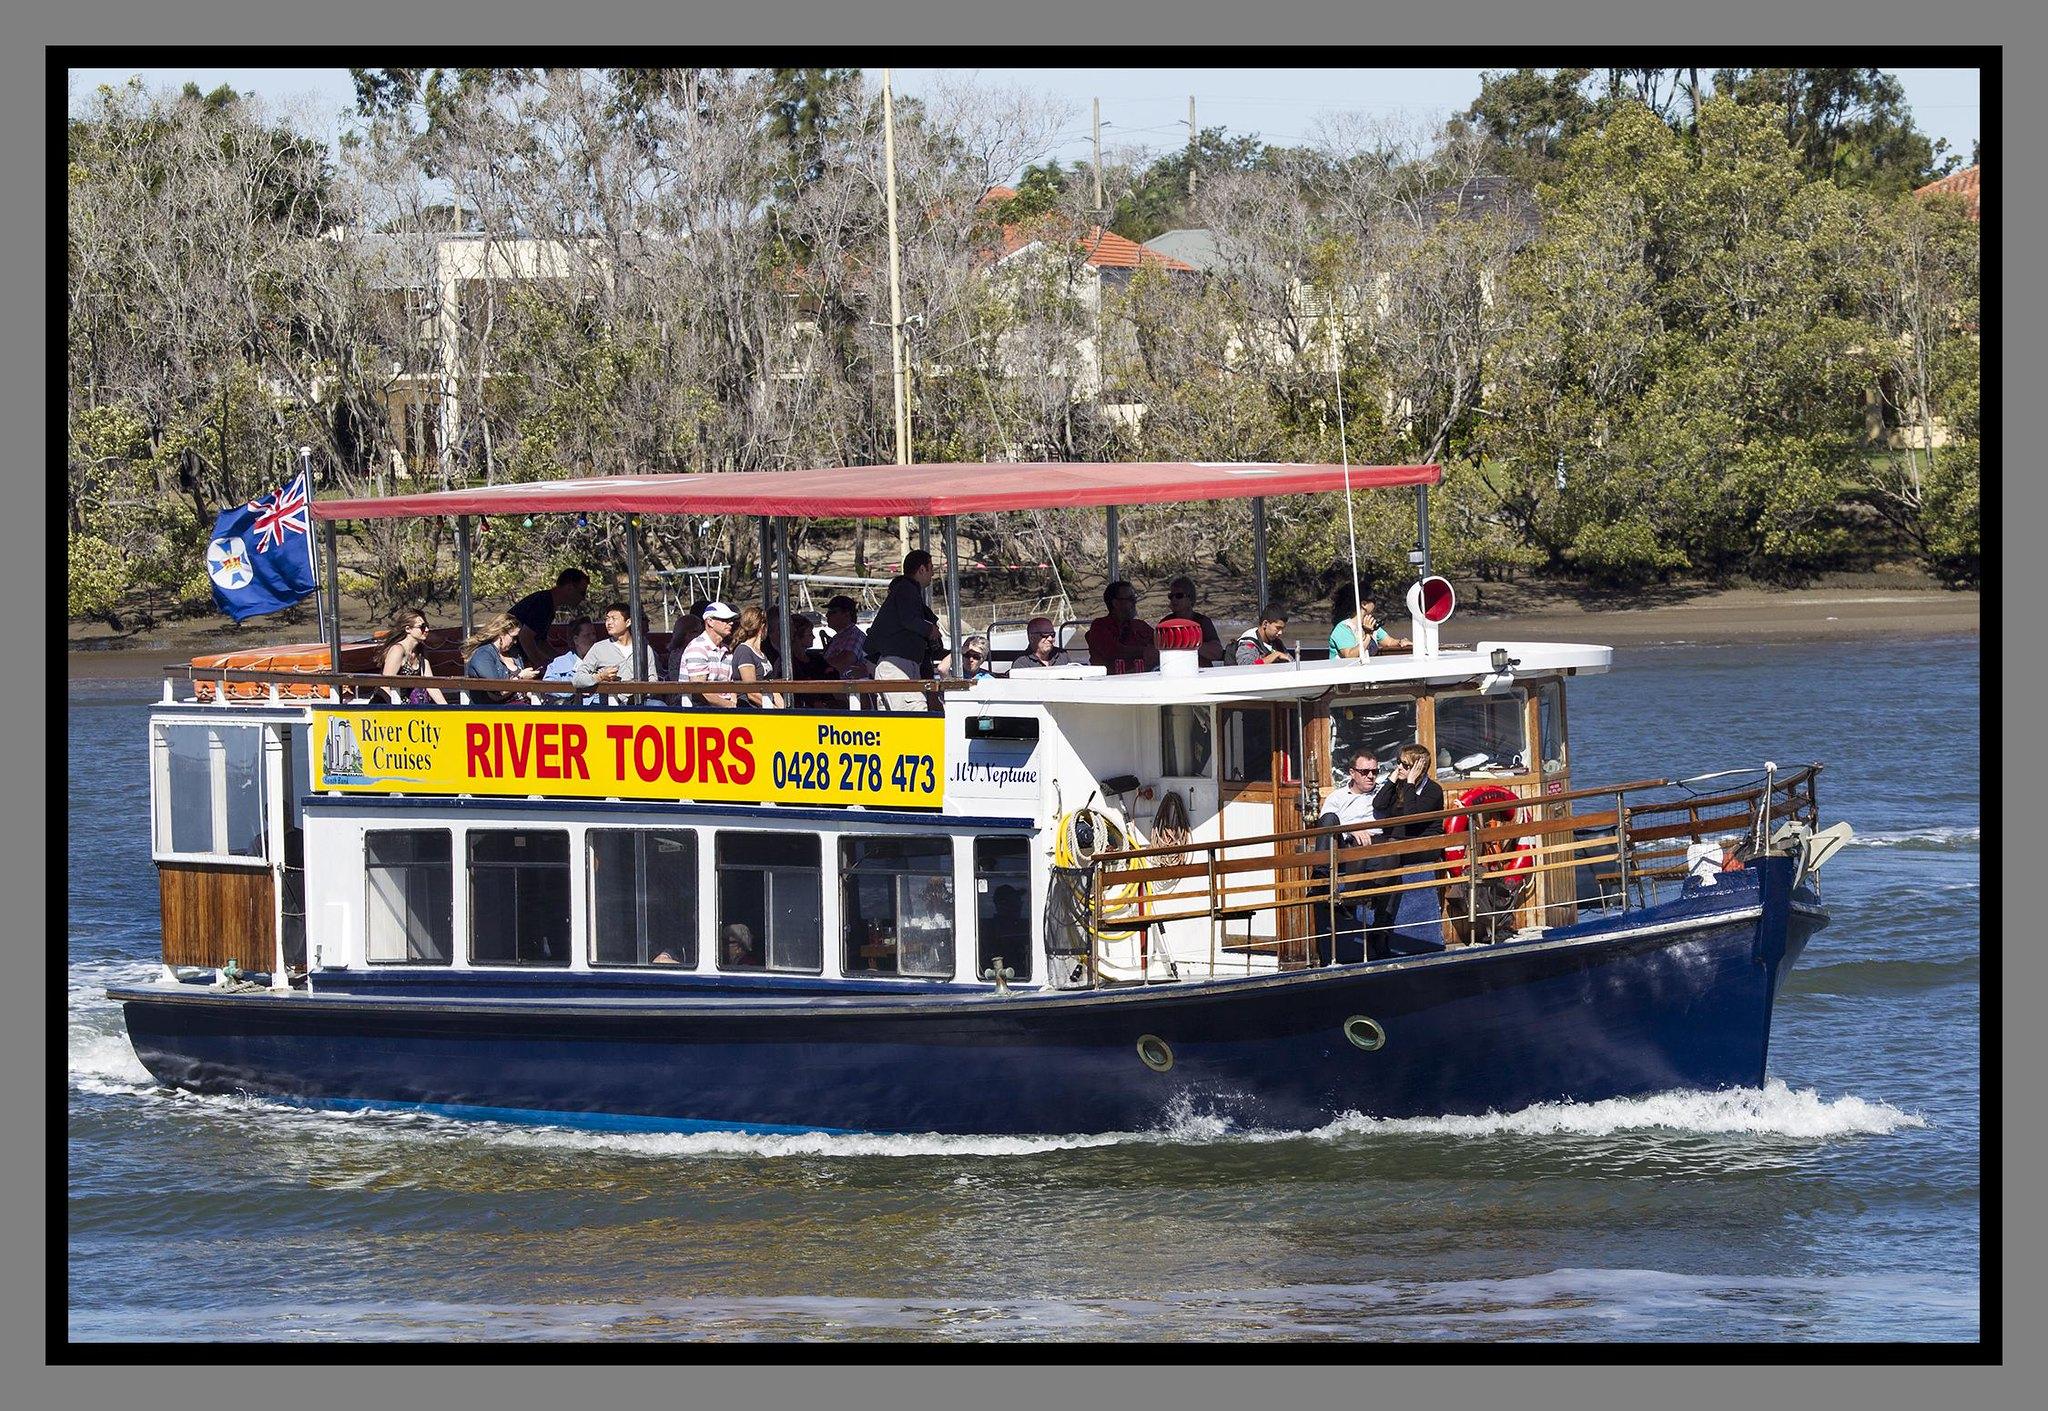 Cruise dating in Brisbane